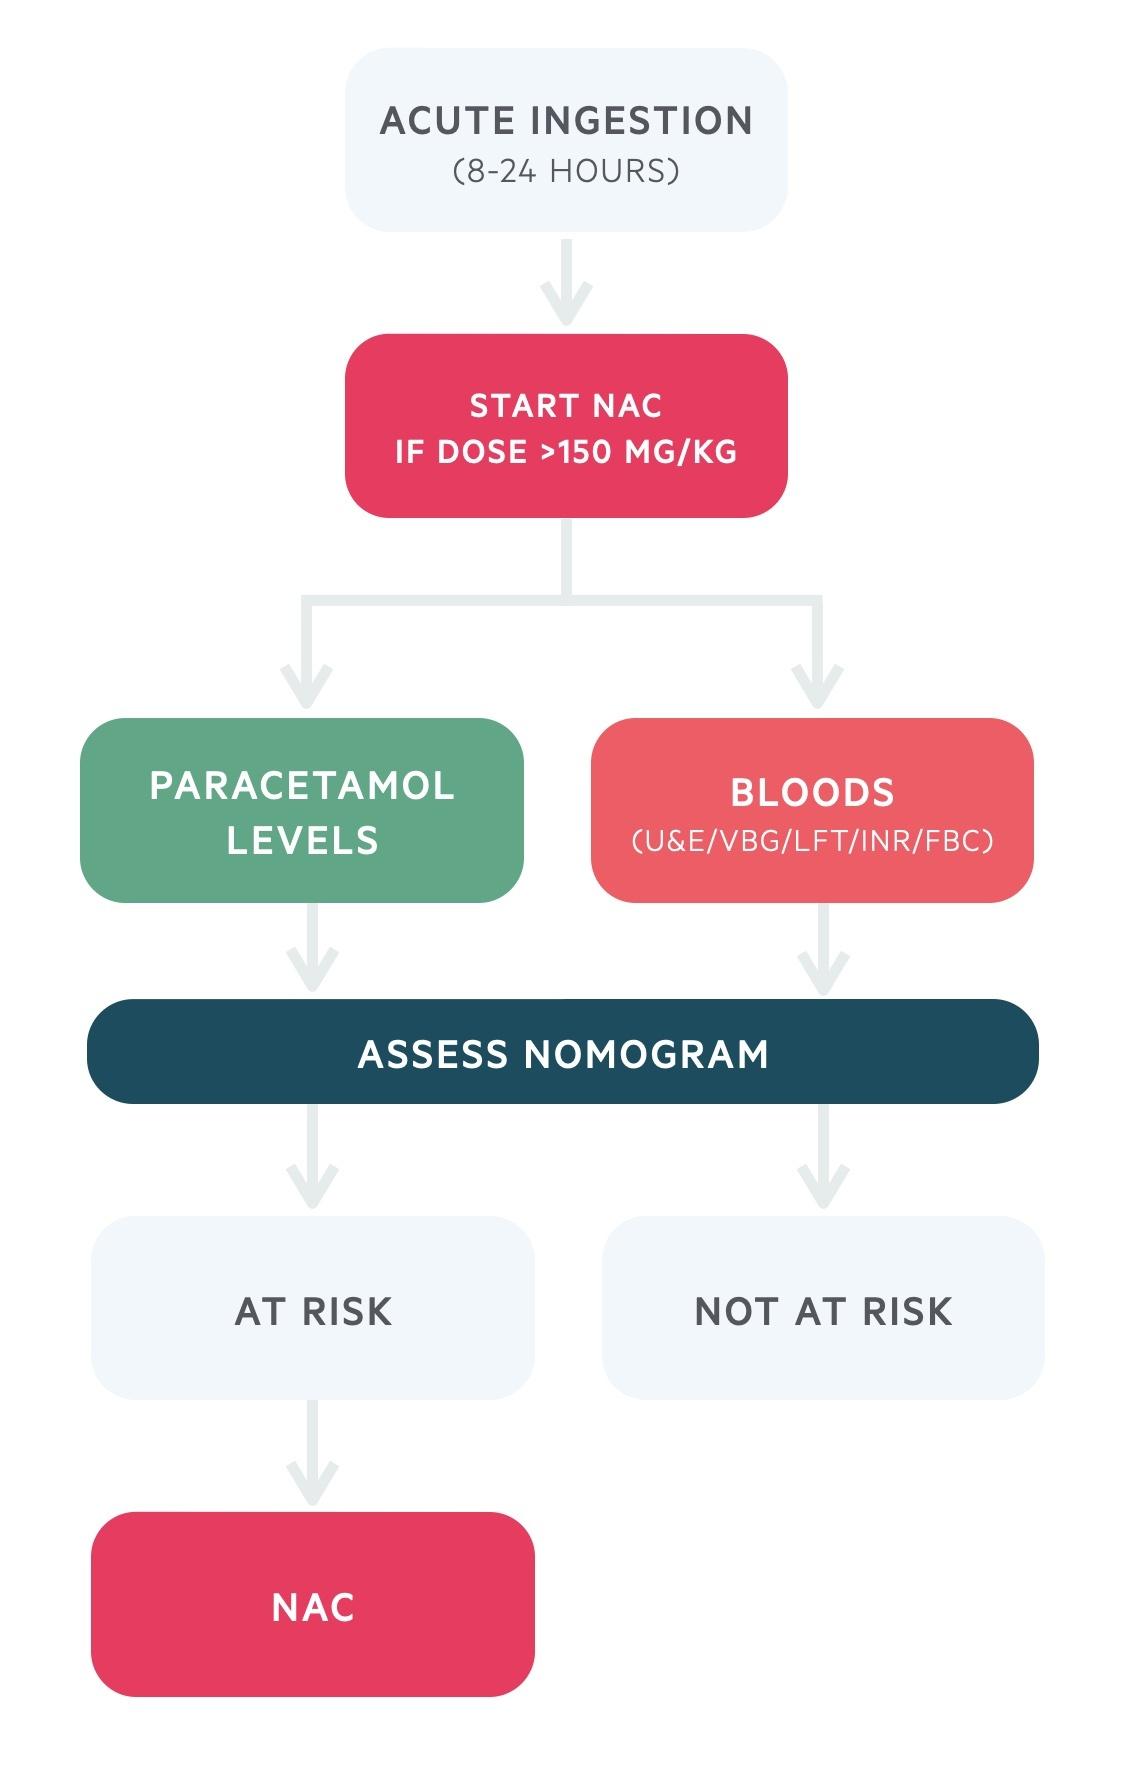 Acute ingestion (8-24 hours) paracetamol overdose management